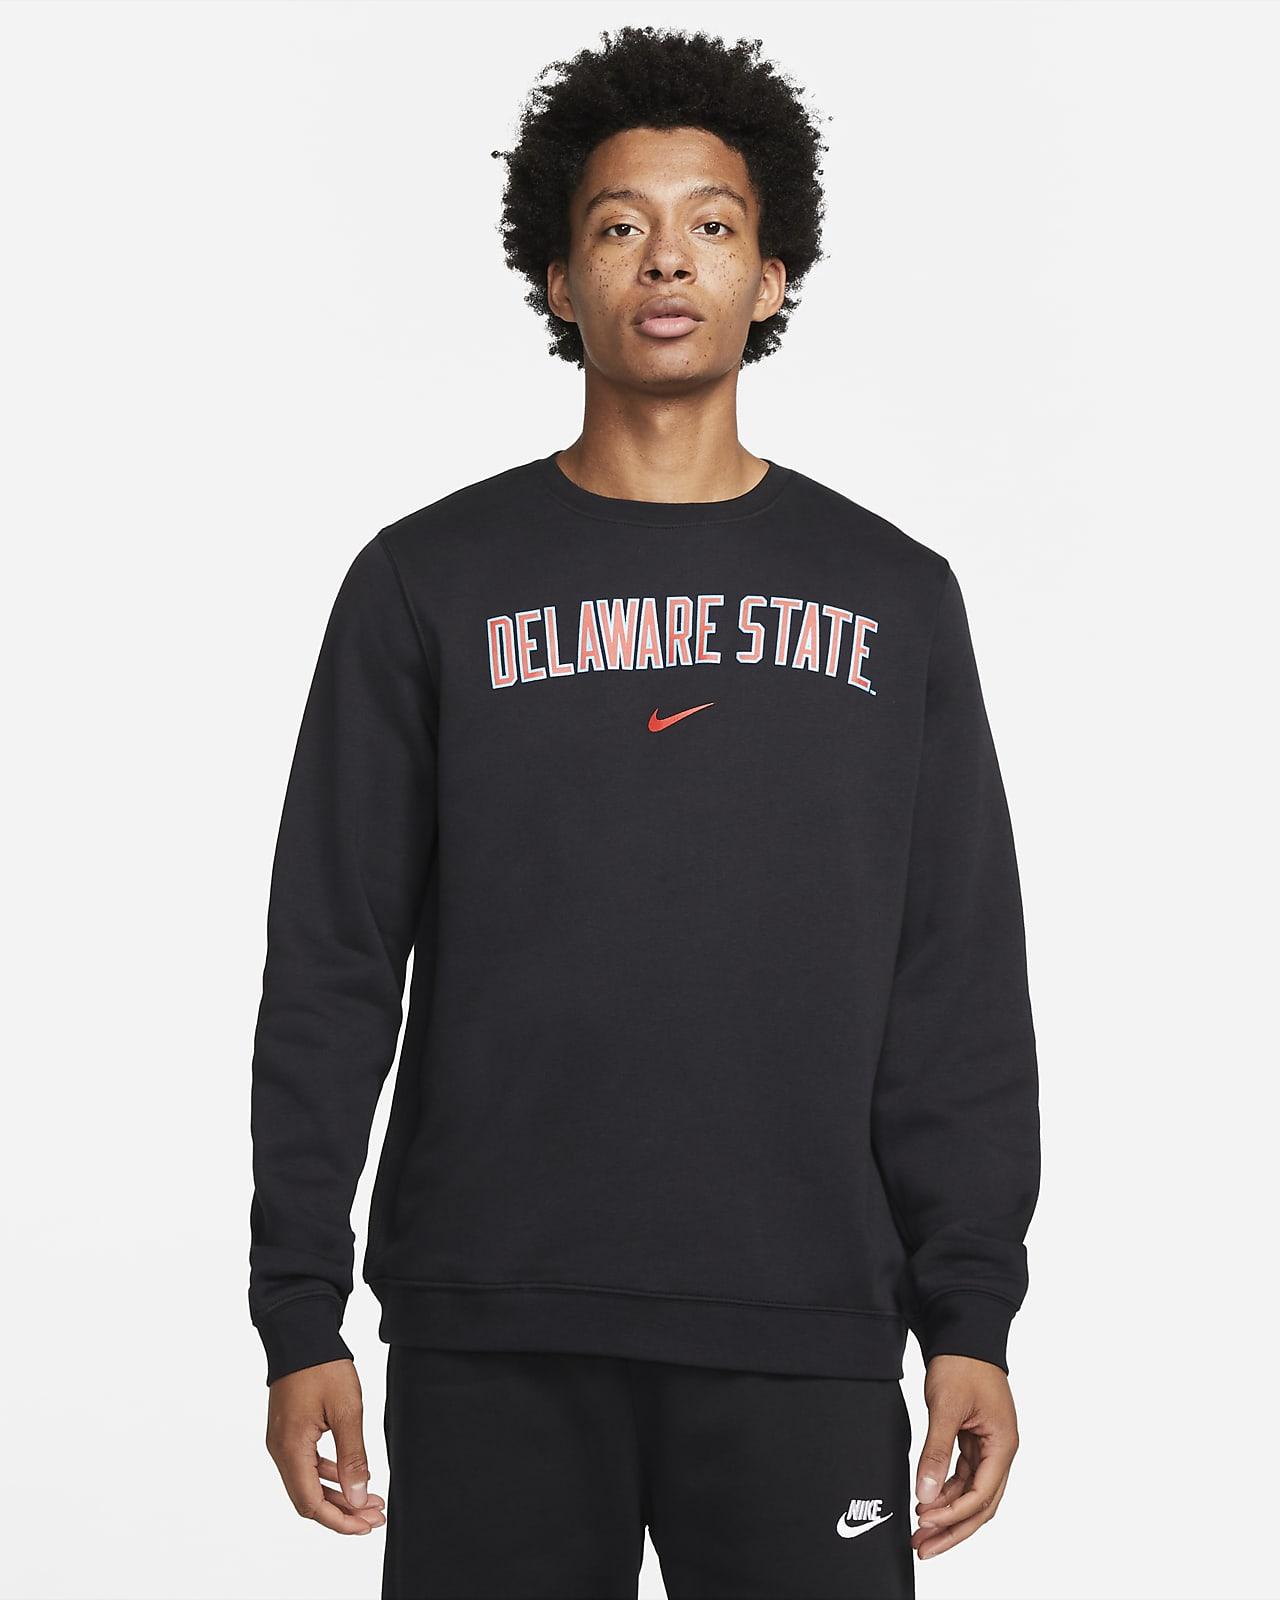 Nike College Club Fleece (Delaware State) Crew Sweatshirt